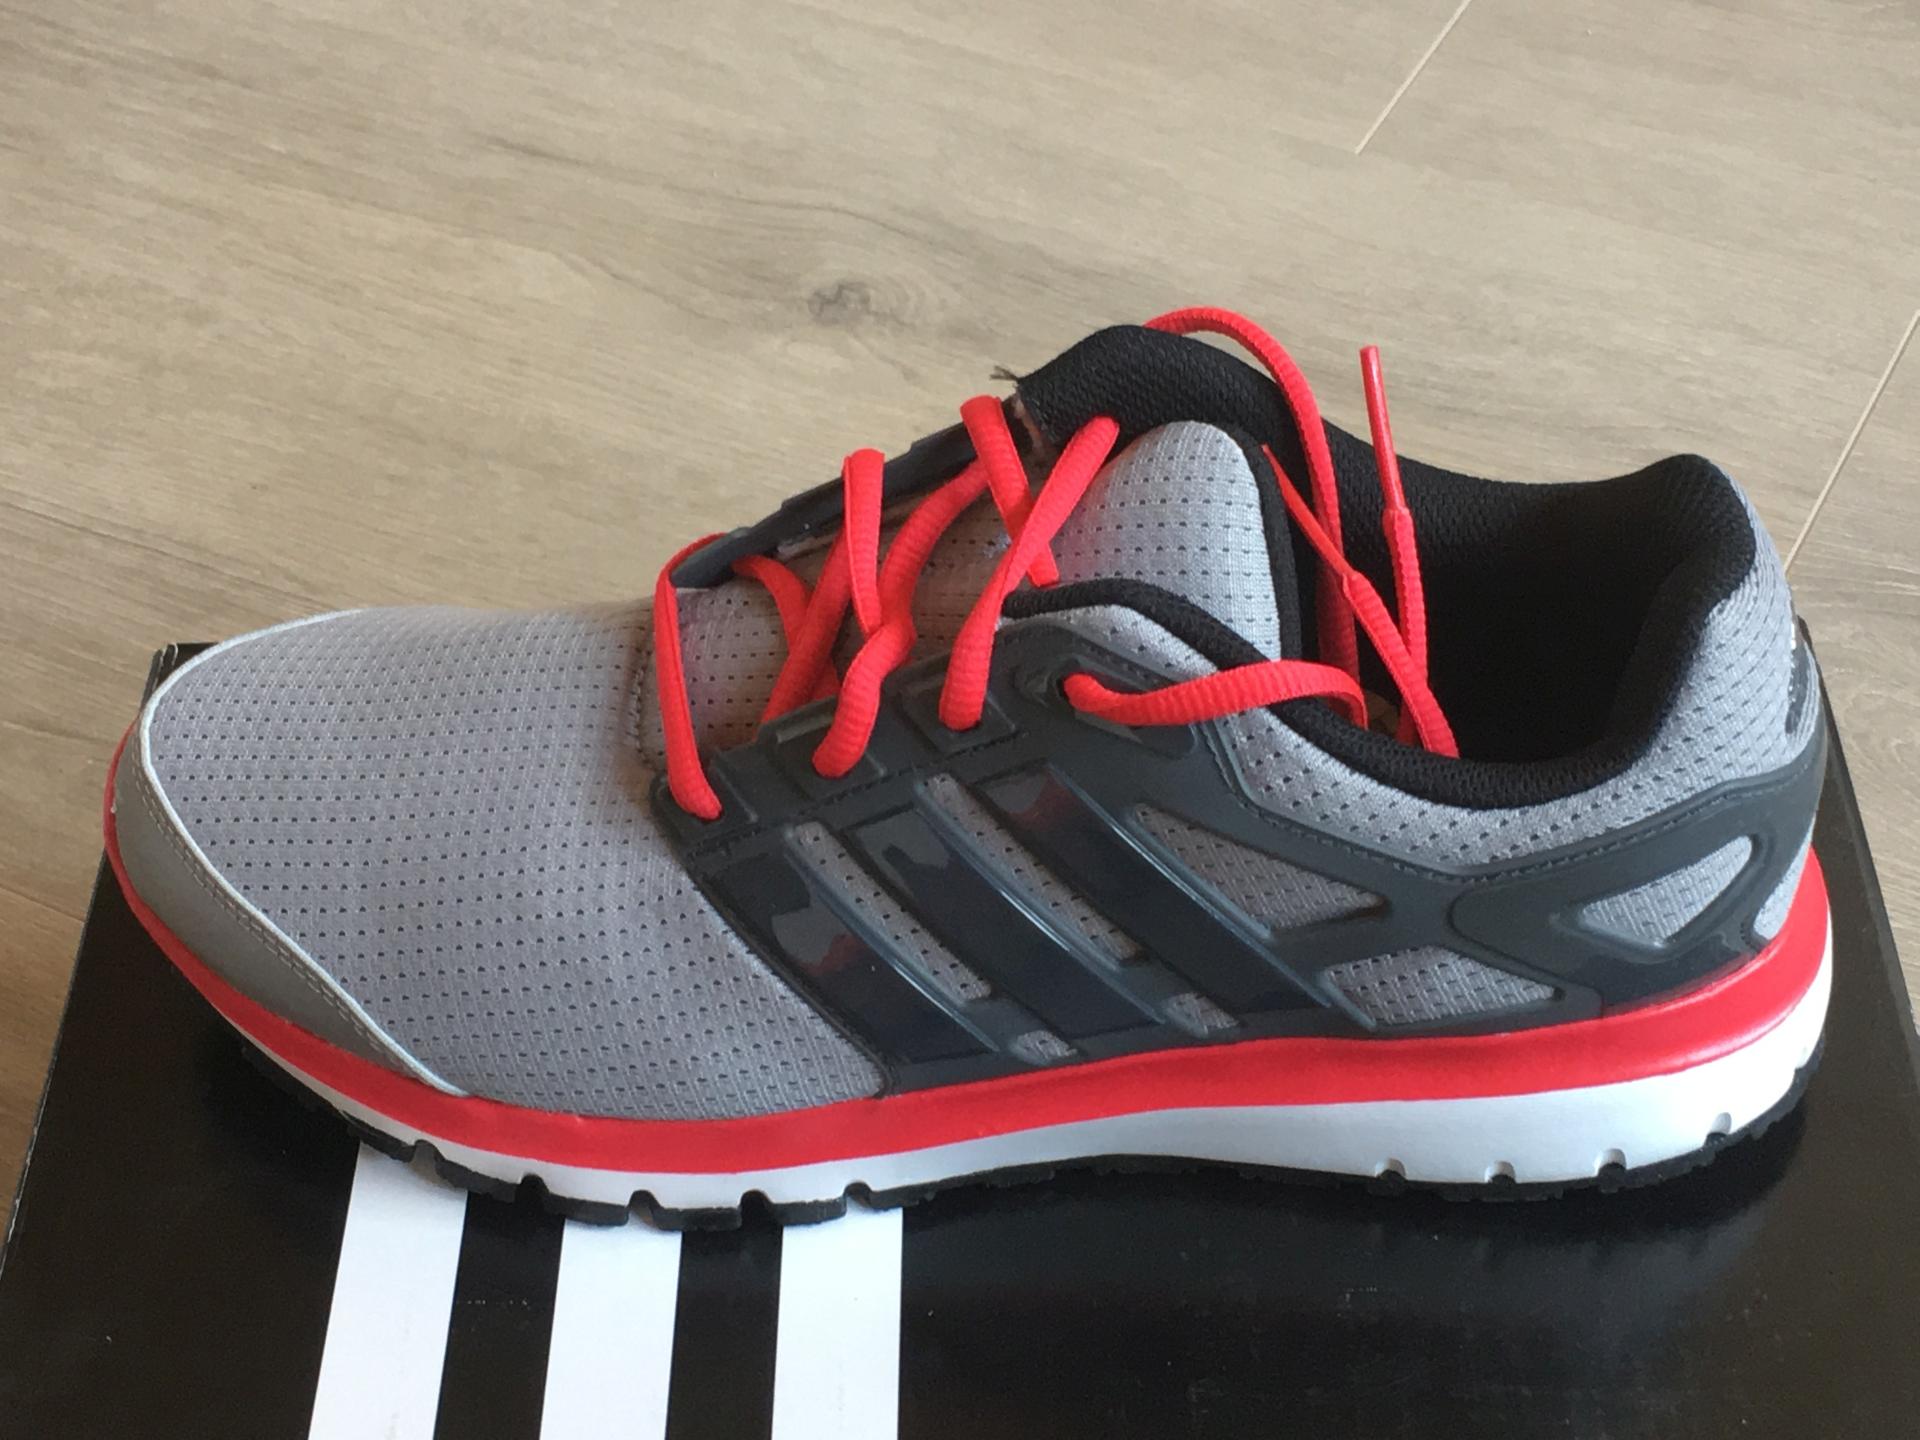 Adidas Energy Cloud M Herren grau Laufschuhe Sneaker Jogging Turnschuhe BB4113   eBay